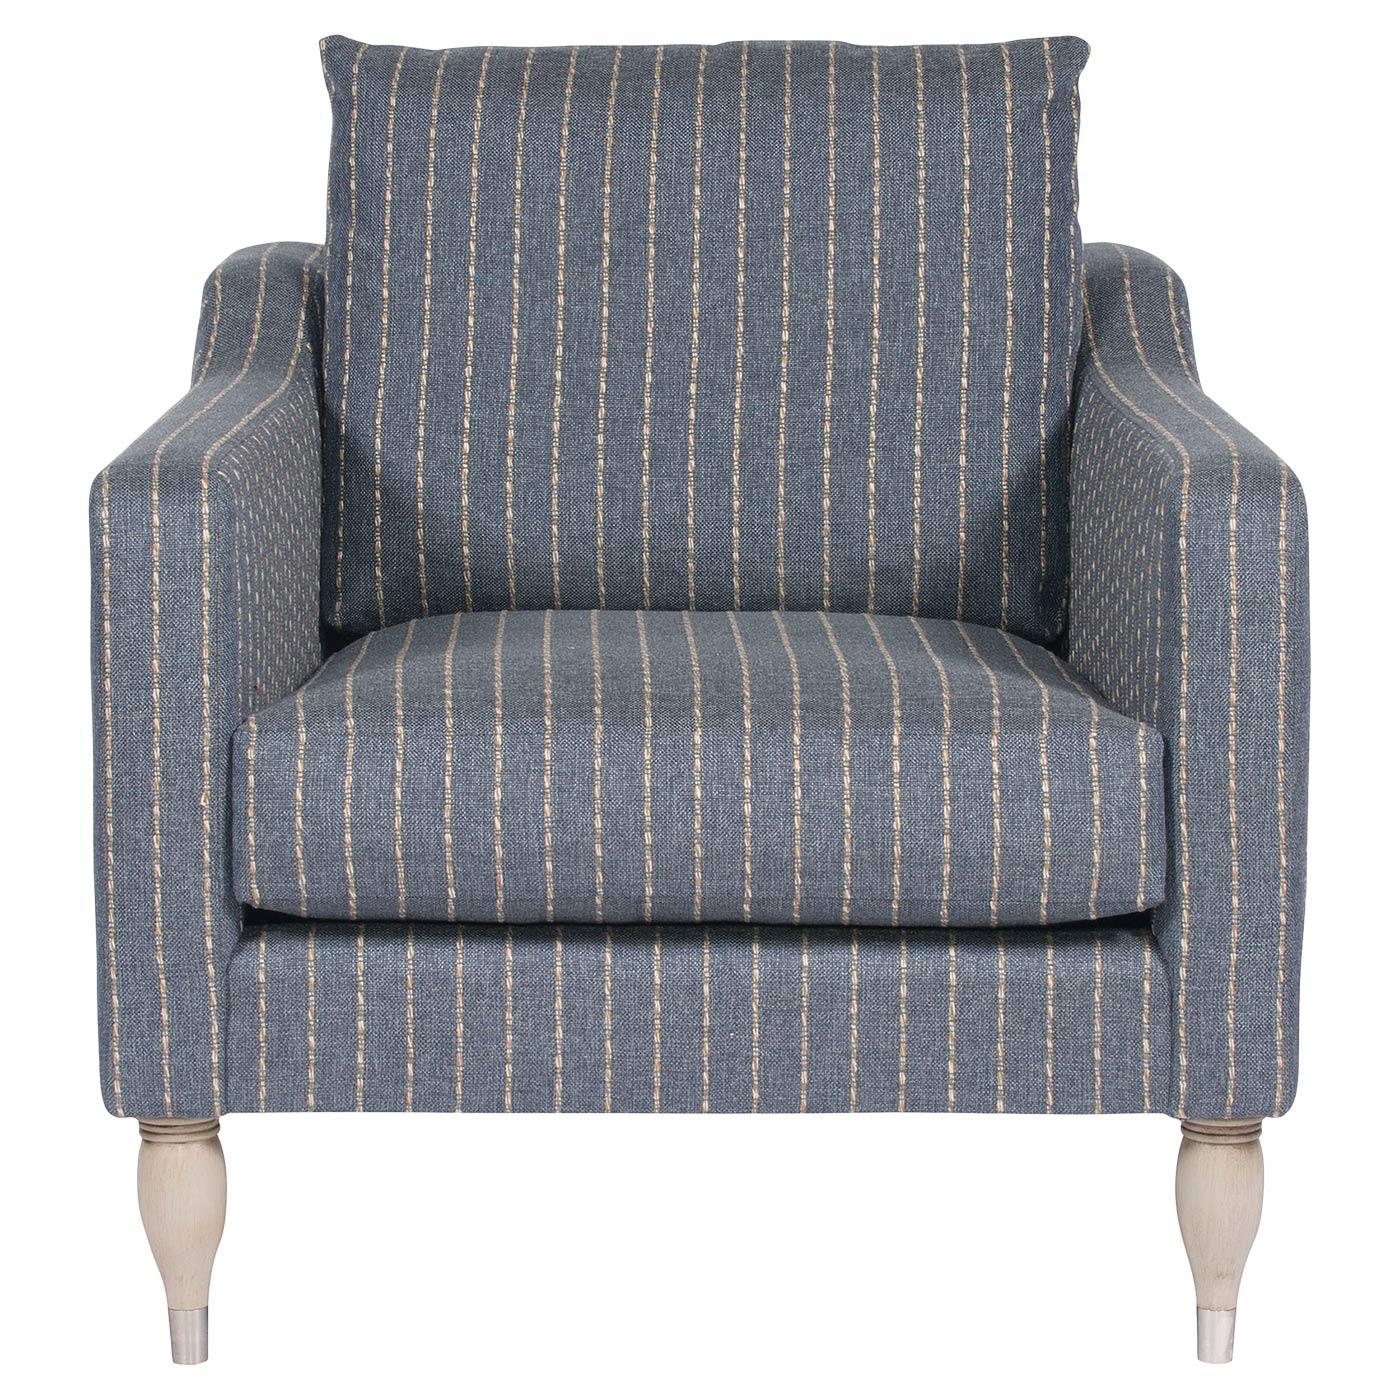 Vanguard Thea Modern Classic Beige Stripe Blue Upholstered Arm Chair